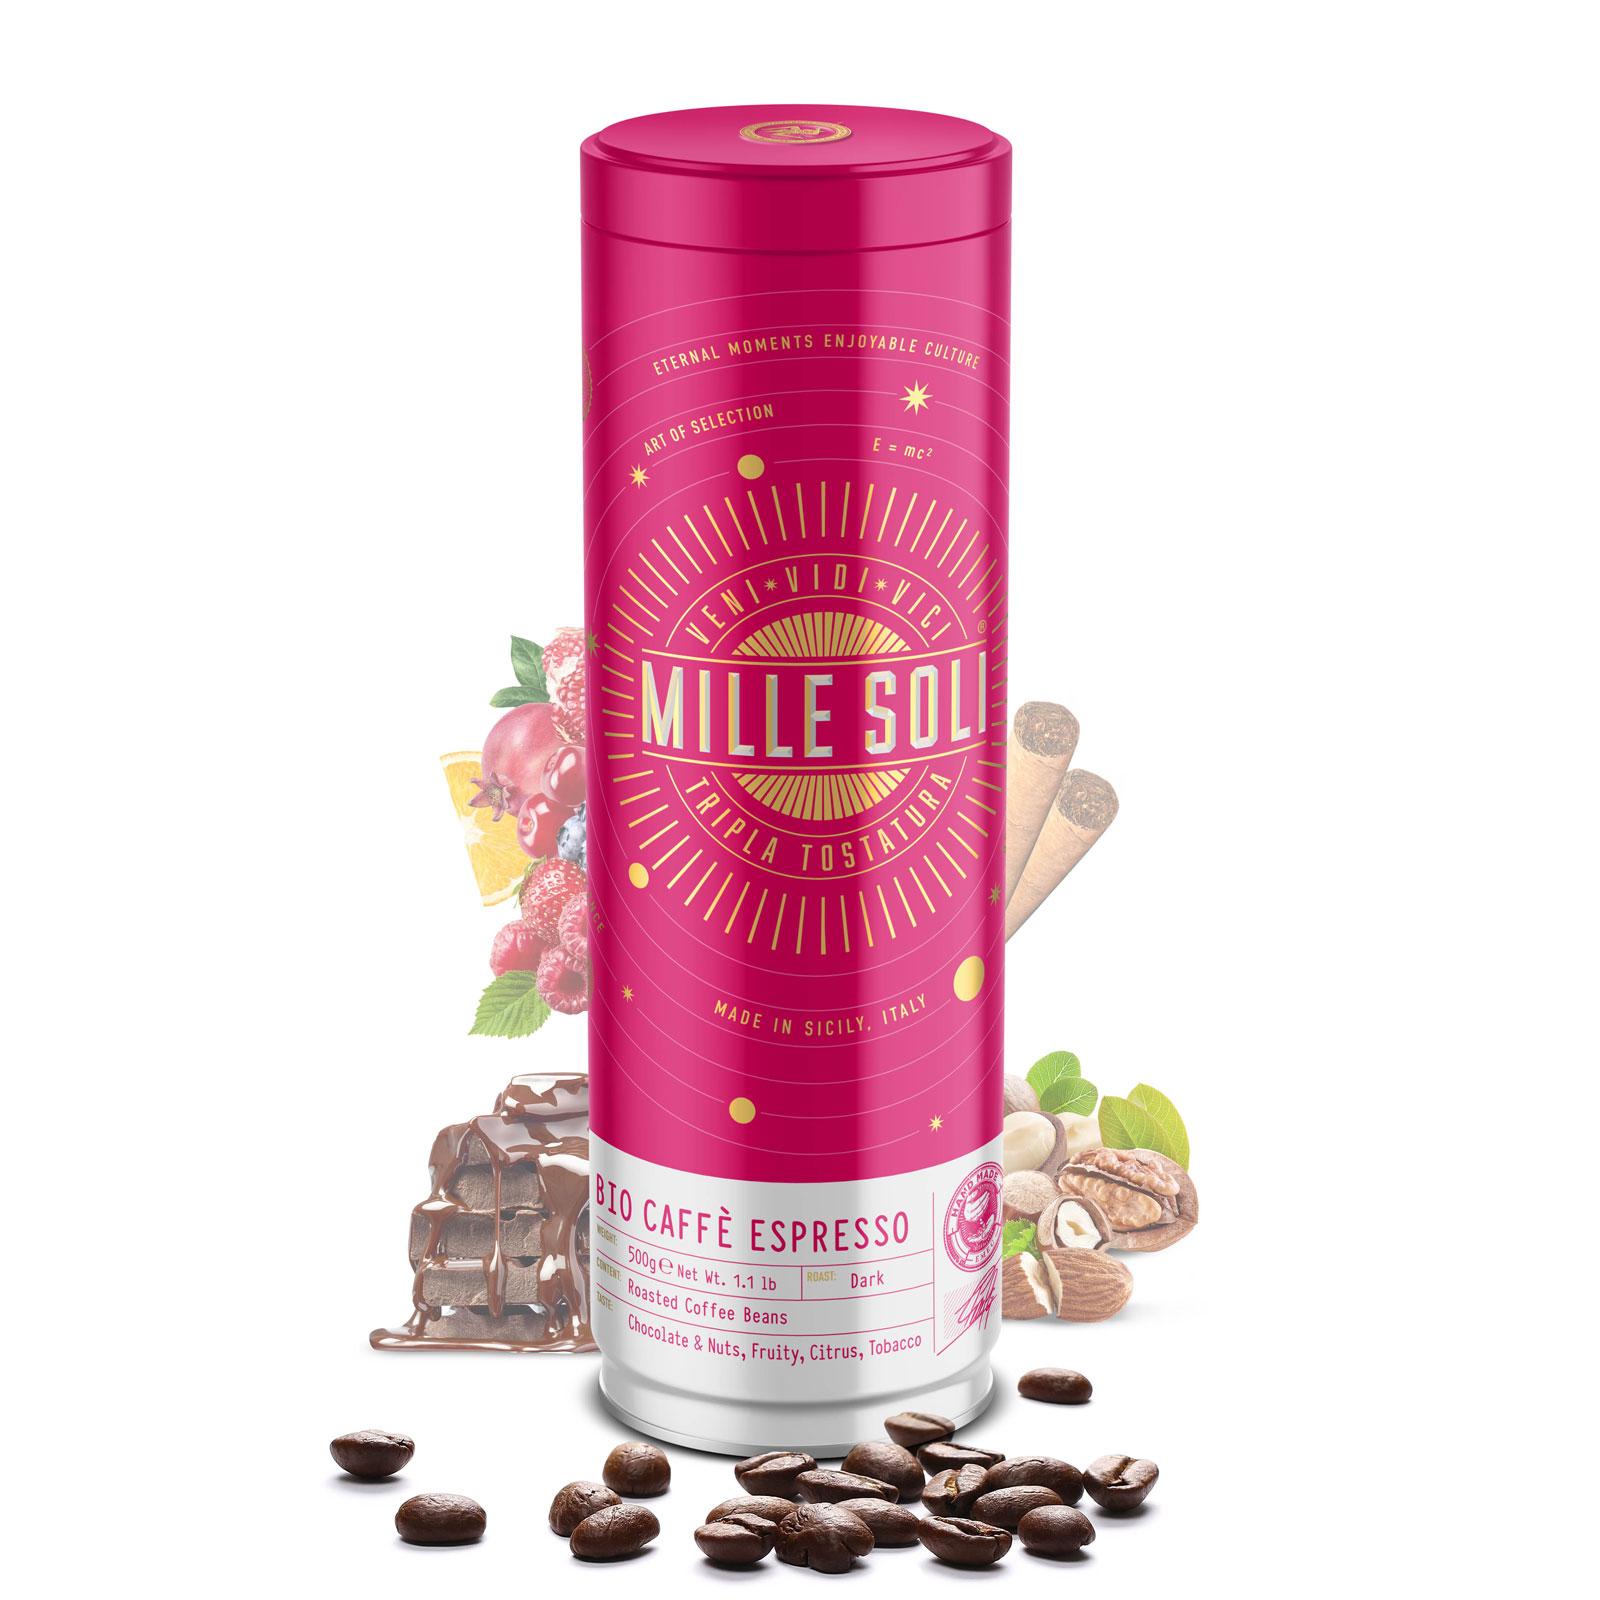 MILLE SOLI - BIO Caffè Espresso - 500g - Bohnen